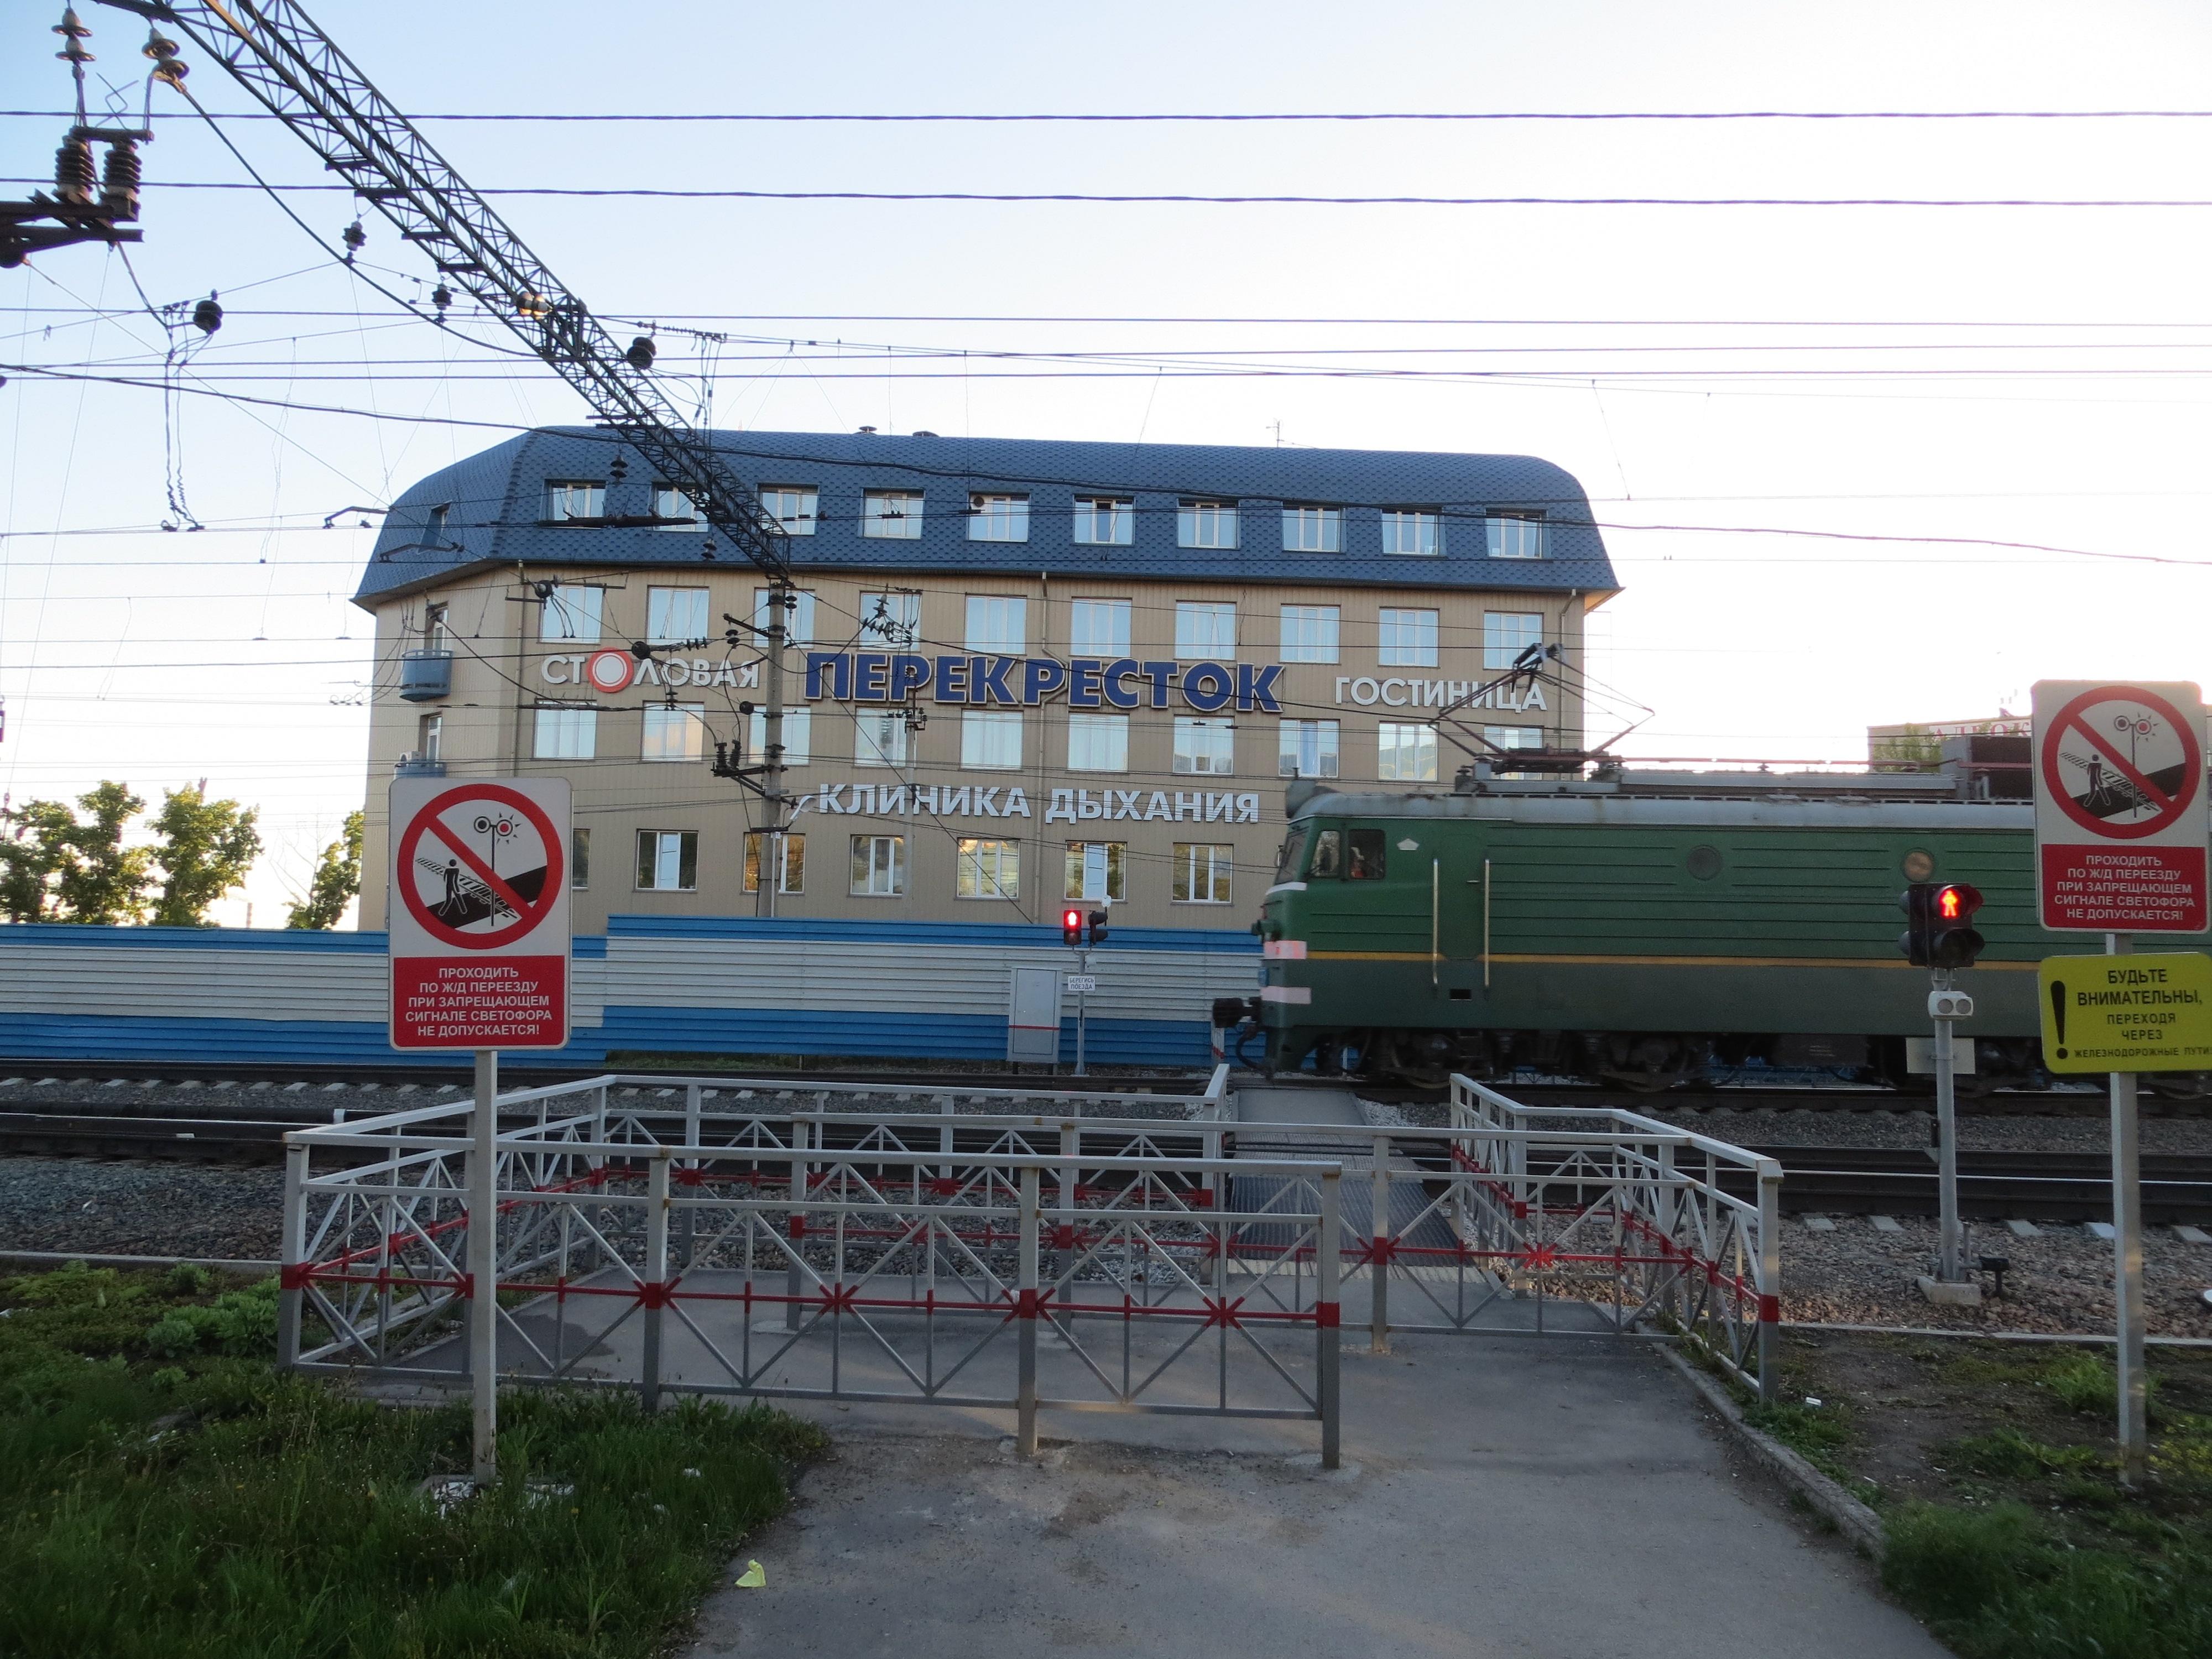 DEN TRANSSIBIRSKE JERNBANEN PASSERER RETT UTENFOR HOTELLVINDUET VÅRT